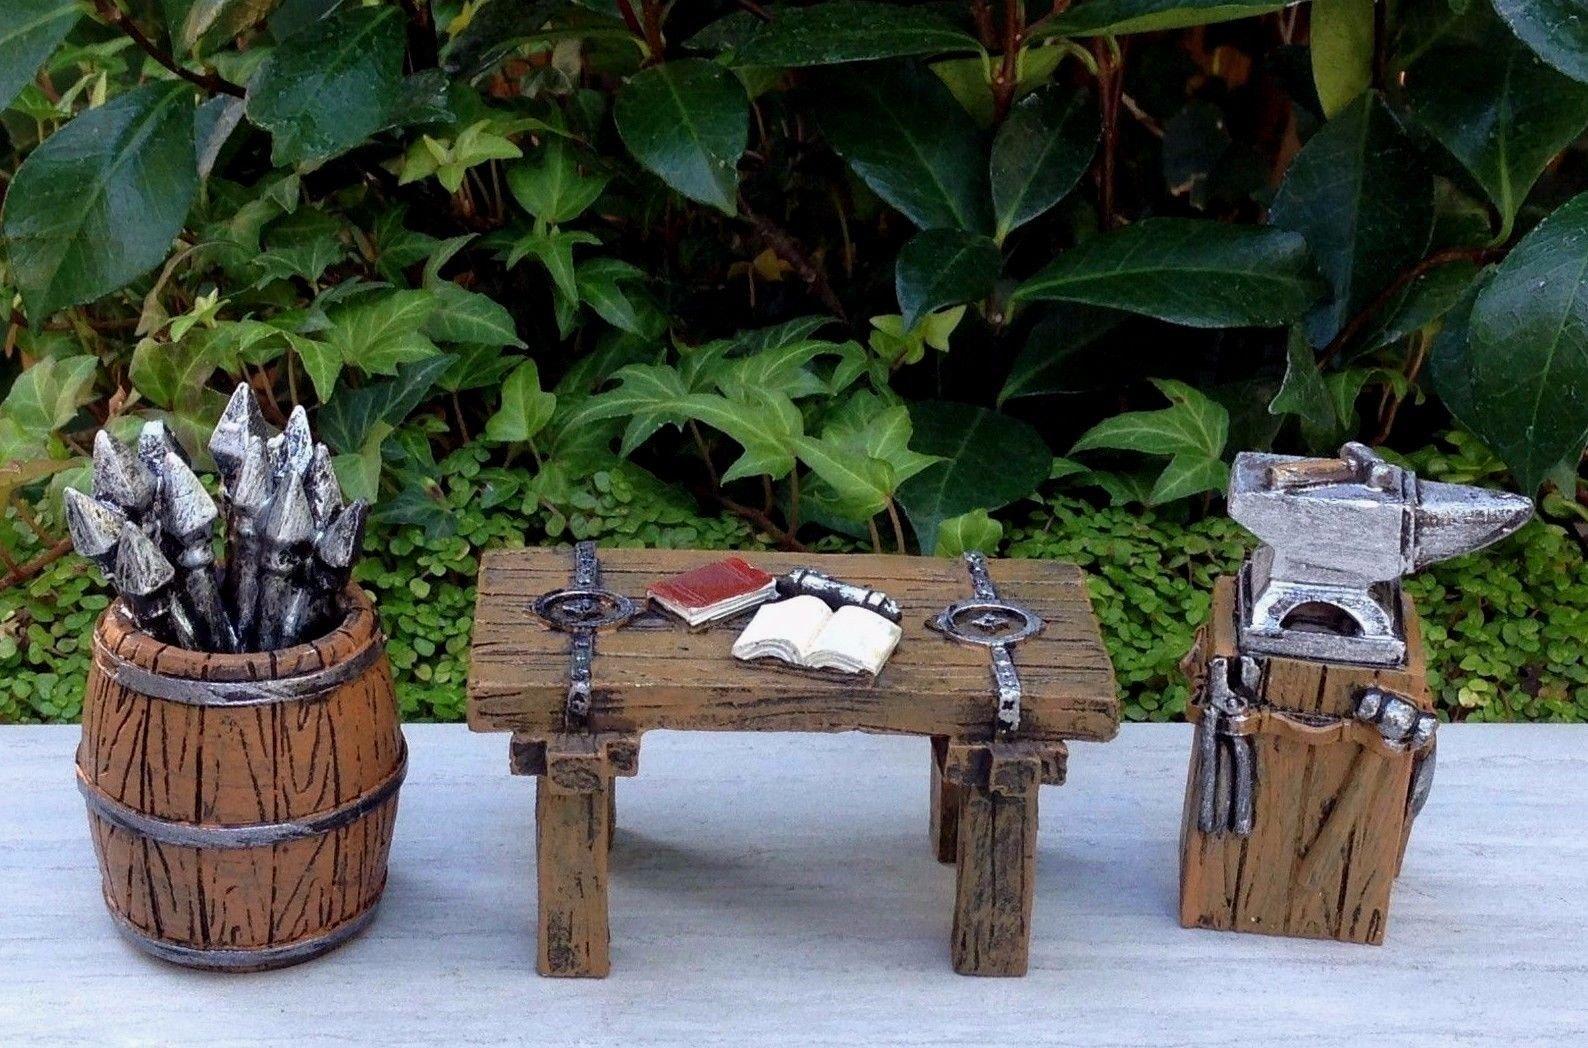 Miniature Dollhouse Fairy Garden Viking Village Set 3 Barrel Table